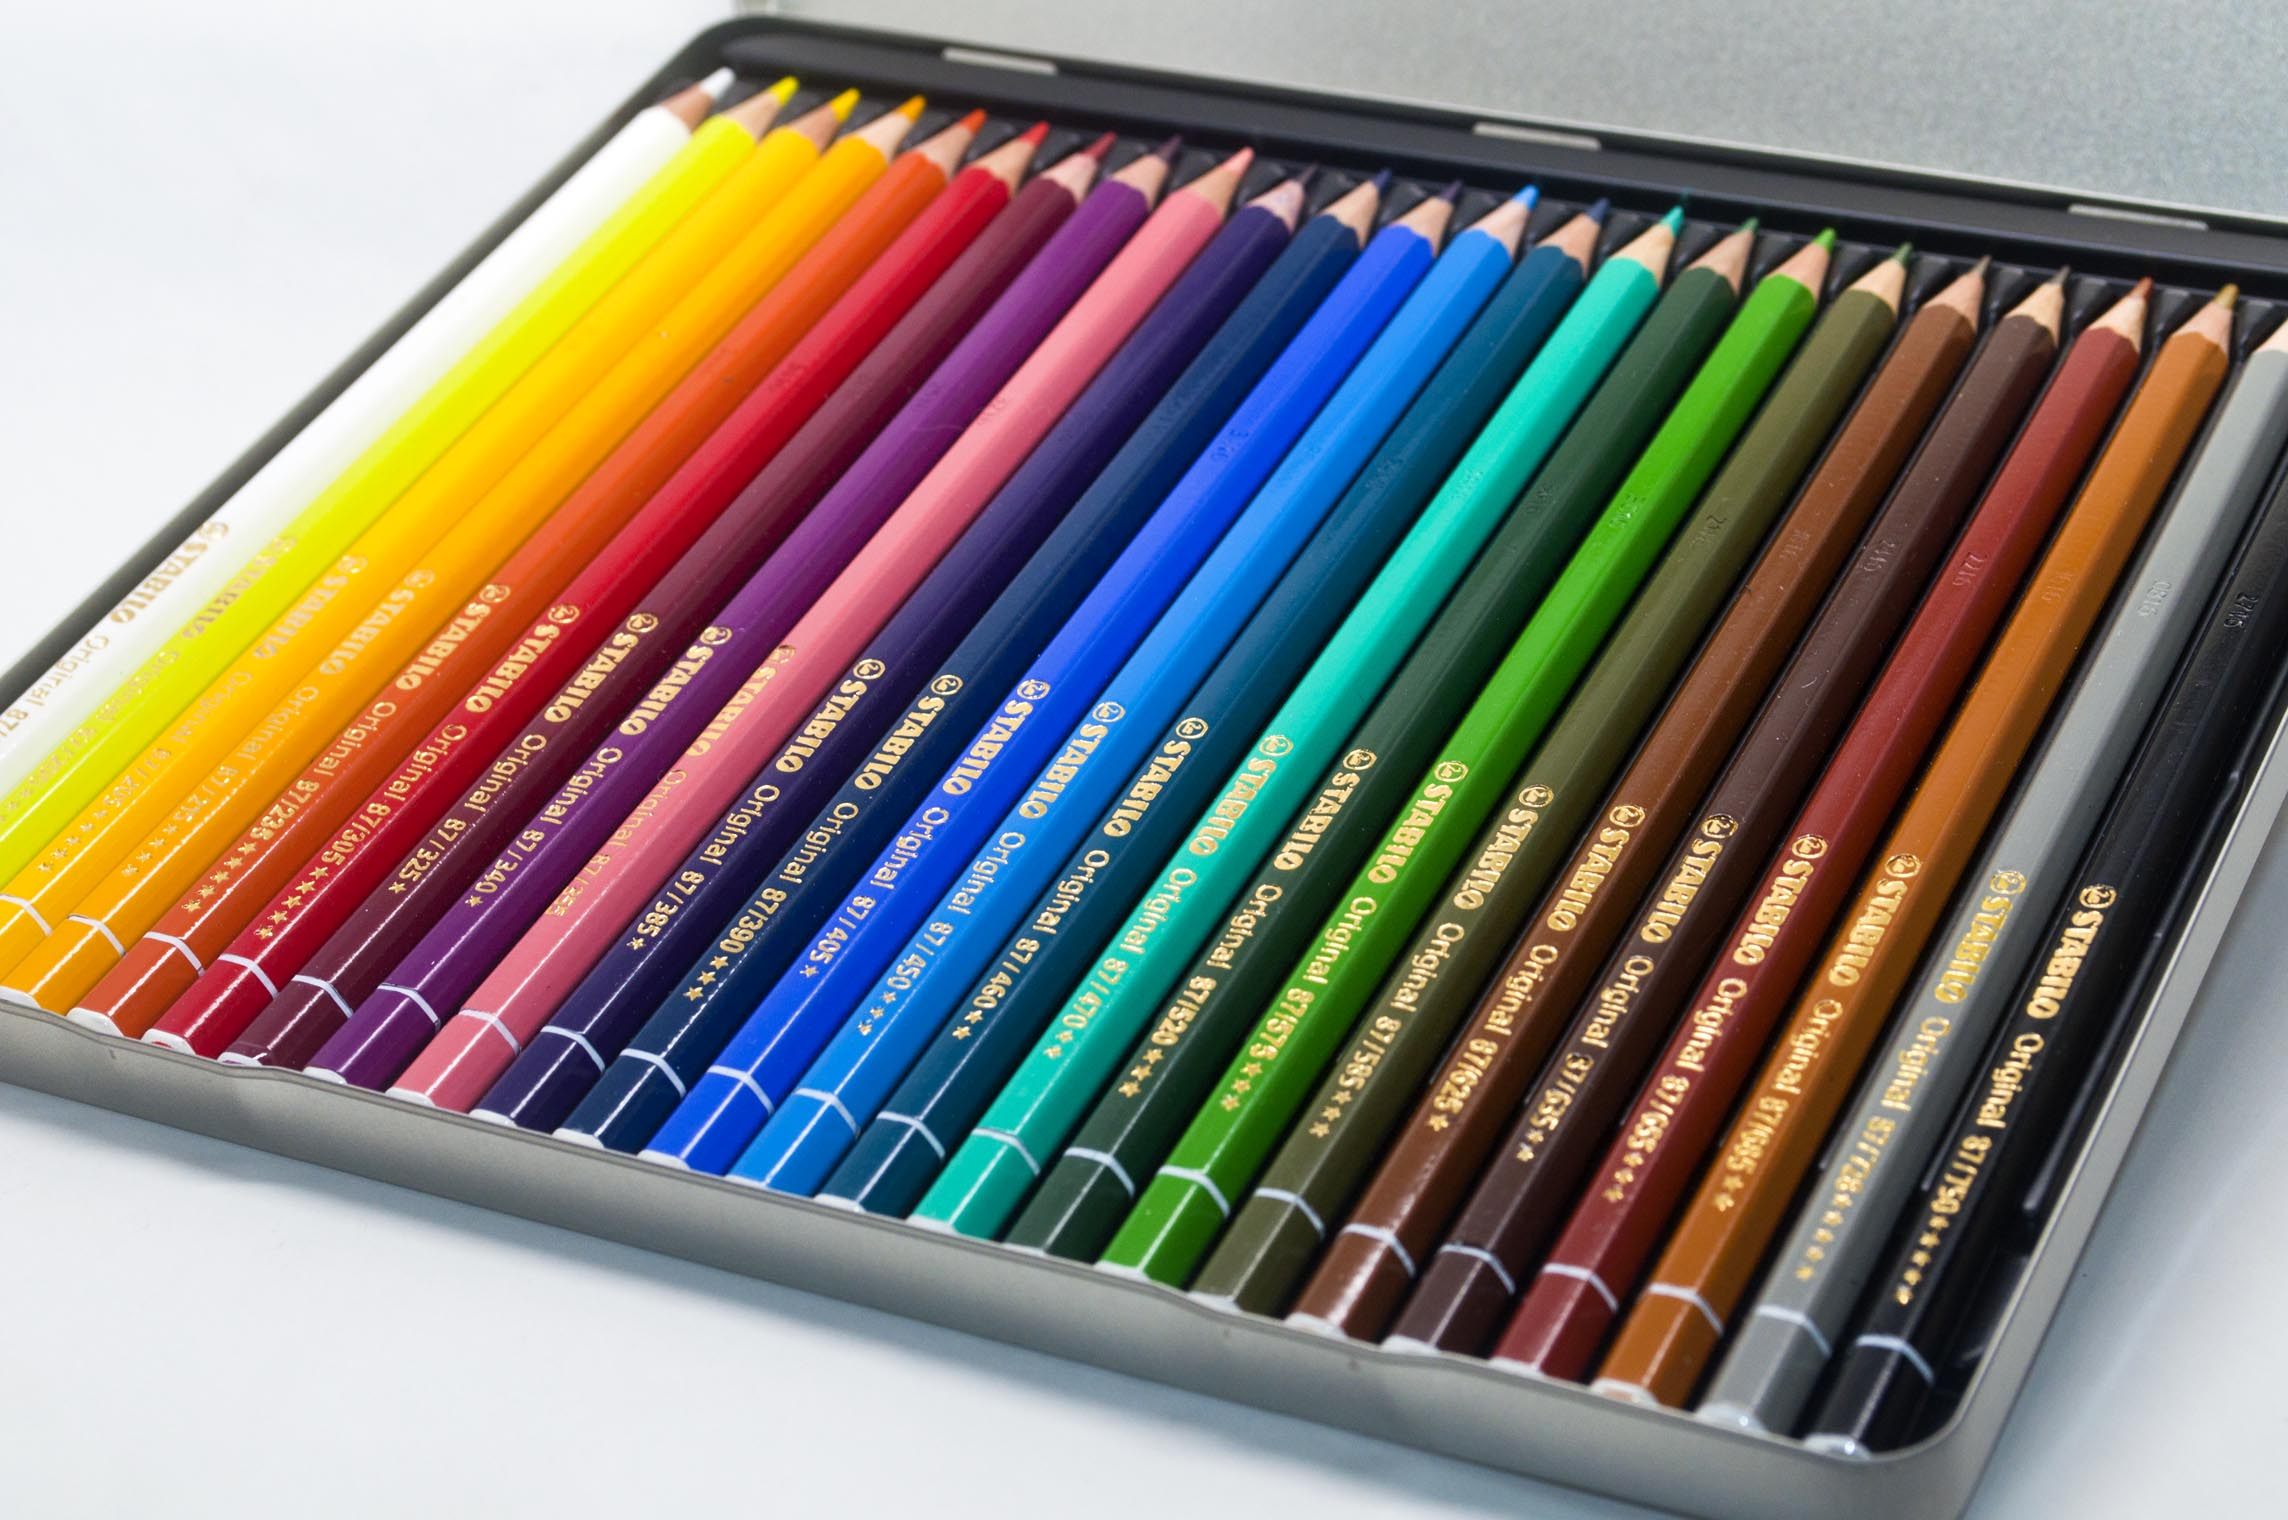 Stabilo Pencils In Tin .jpg